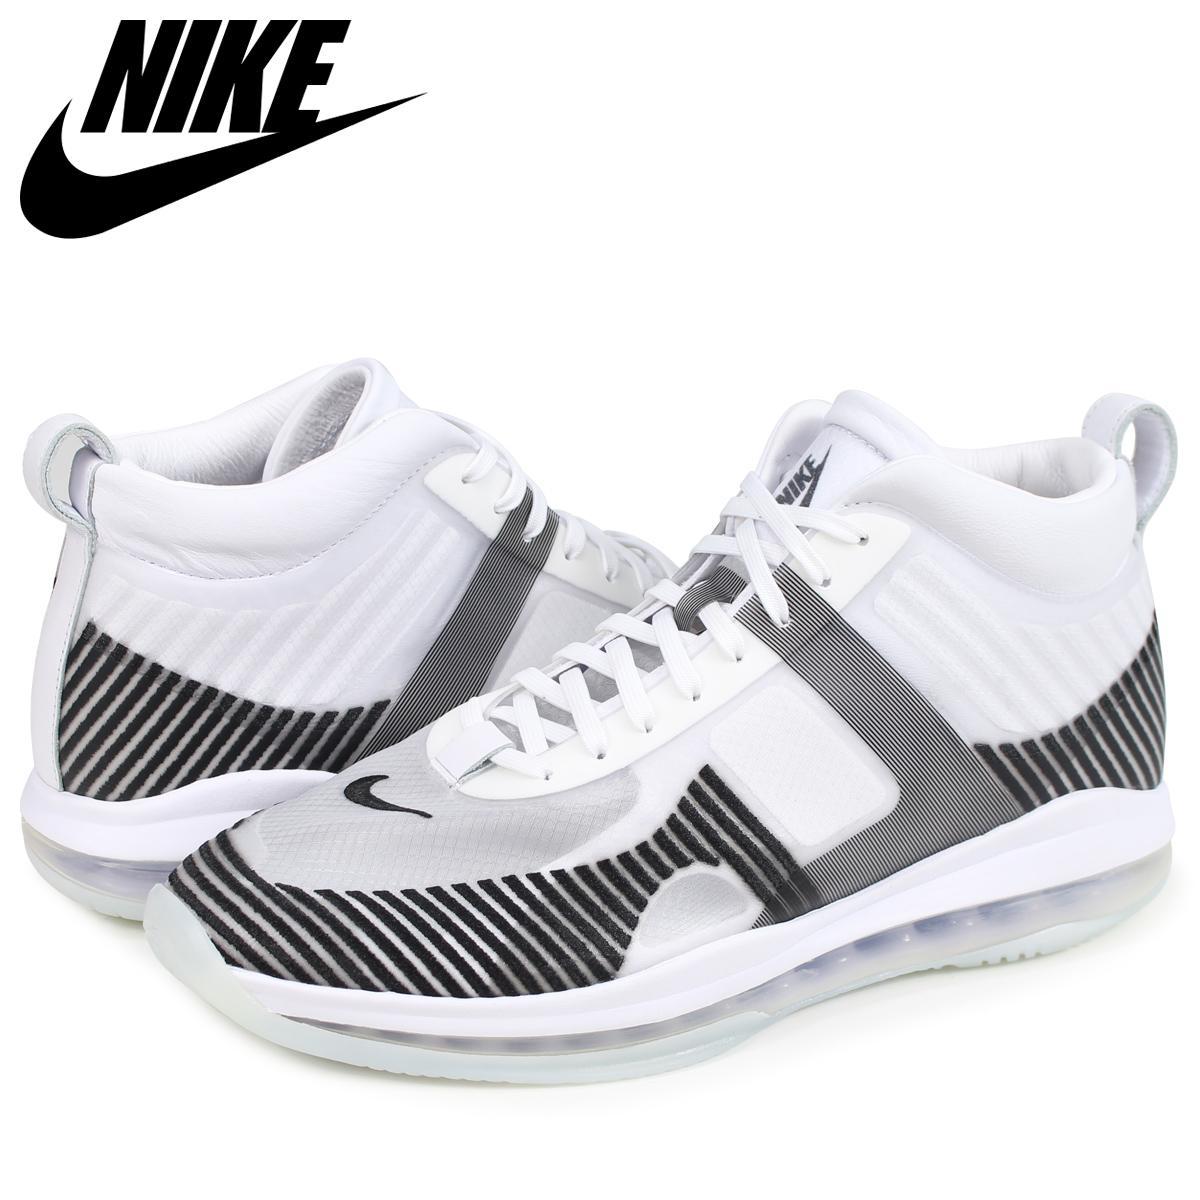 50308540979 NIKE LEBRON X LE ICON JOHN ELLIOTT Nike Revlon sneakers men AQ0114-100 white